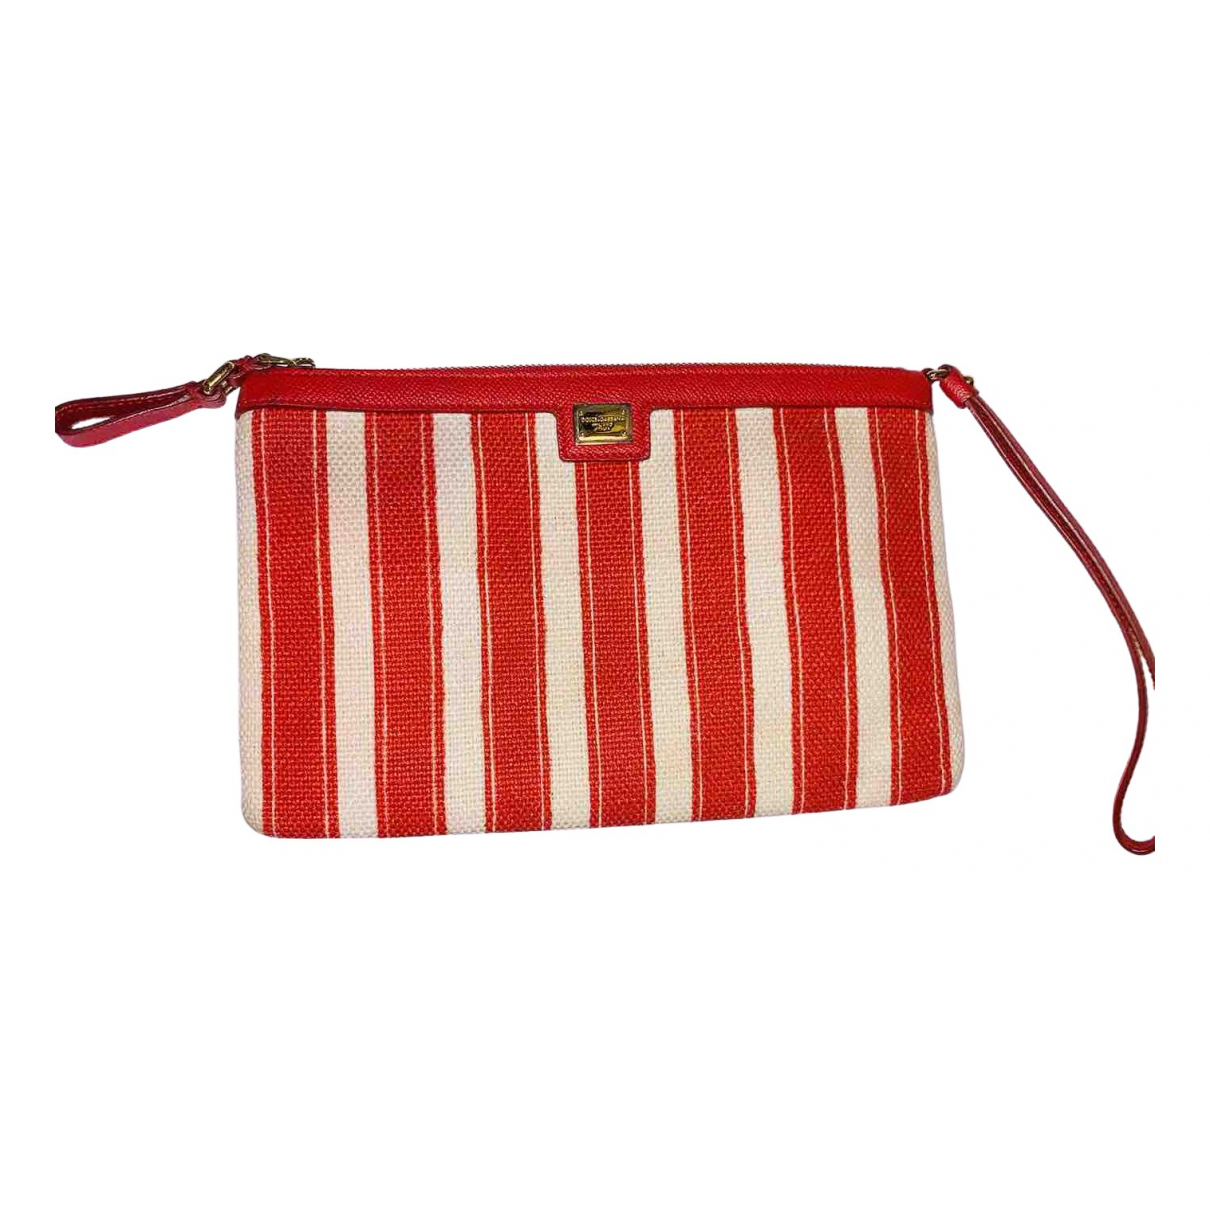 Dolce & Gabbana \N Clutch in  Rot Leinen